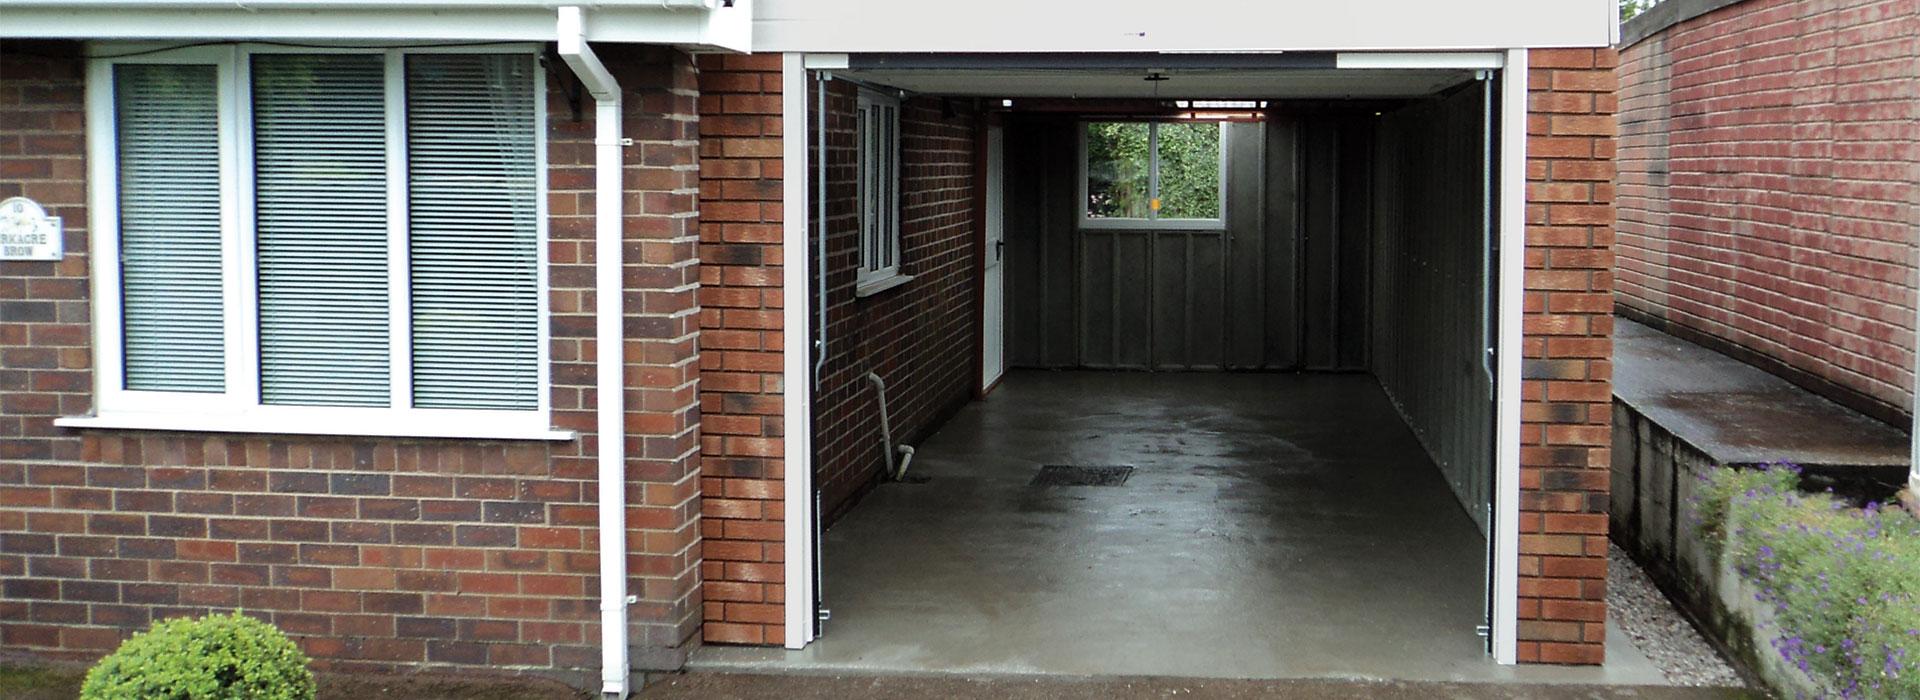 Concrete Garages Edinburgh